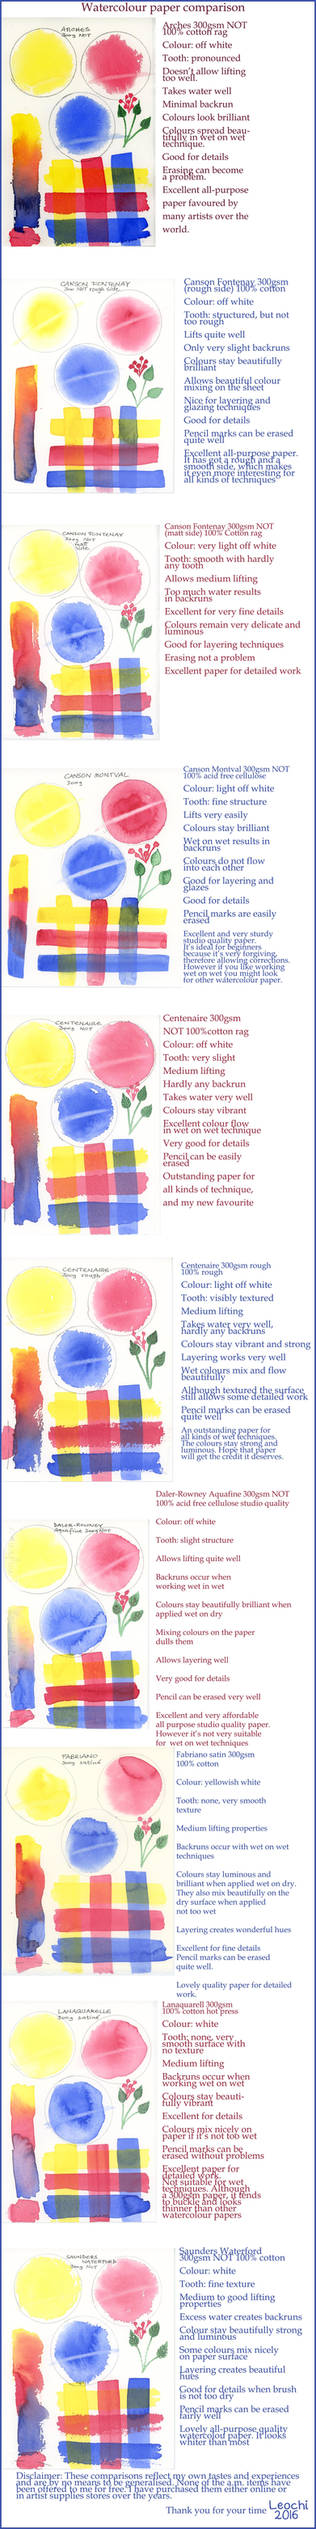 Watercolour Paper Comparison